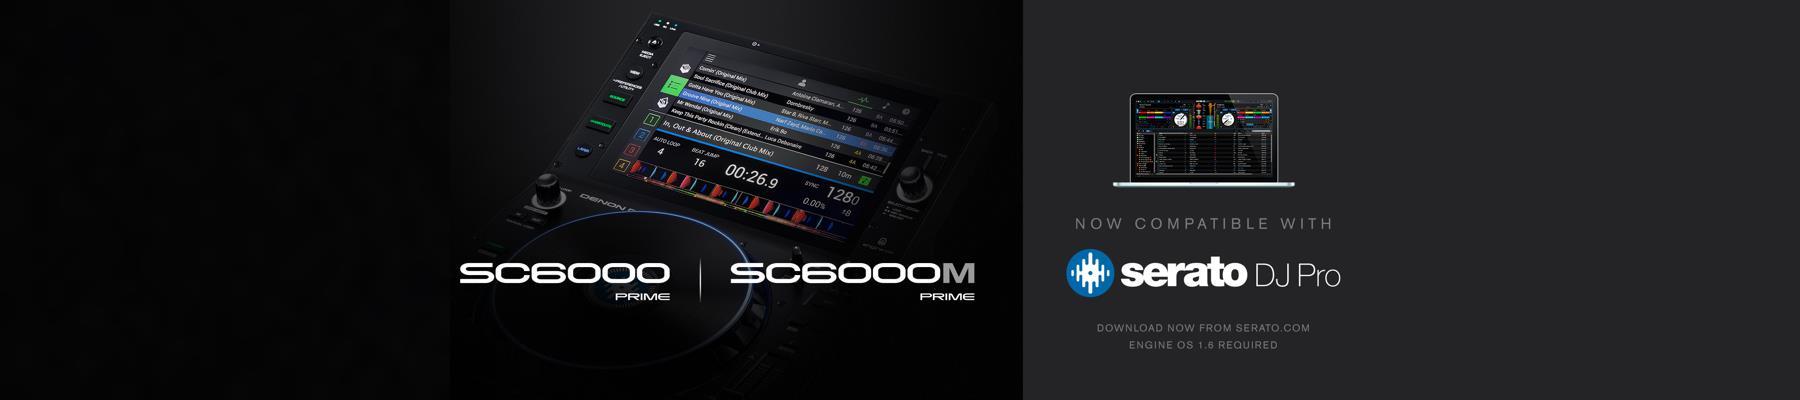 Serato DJ Pro Integration for SC6000 and SC6000M